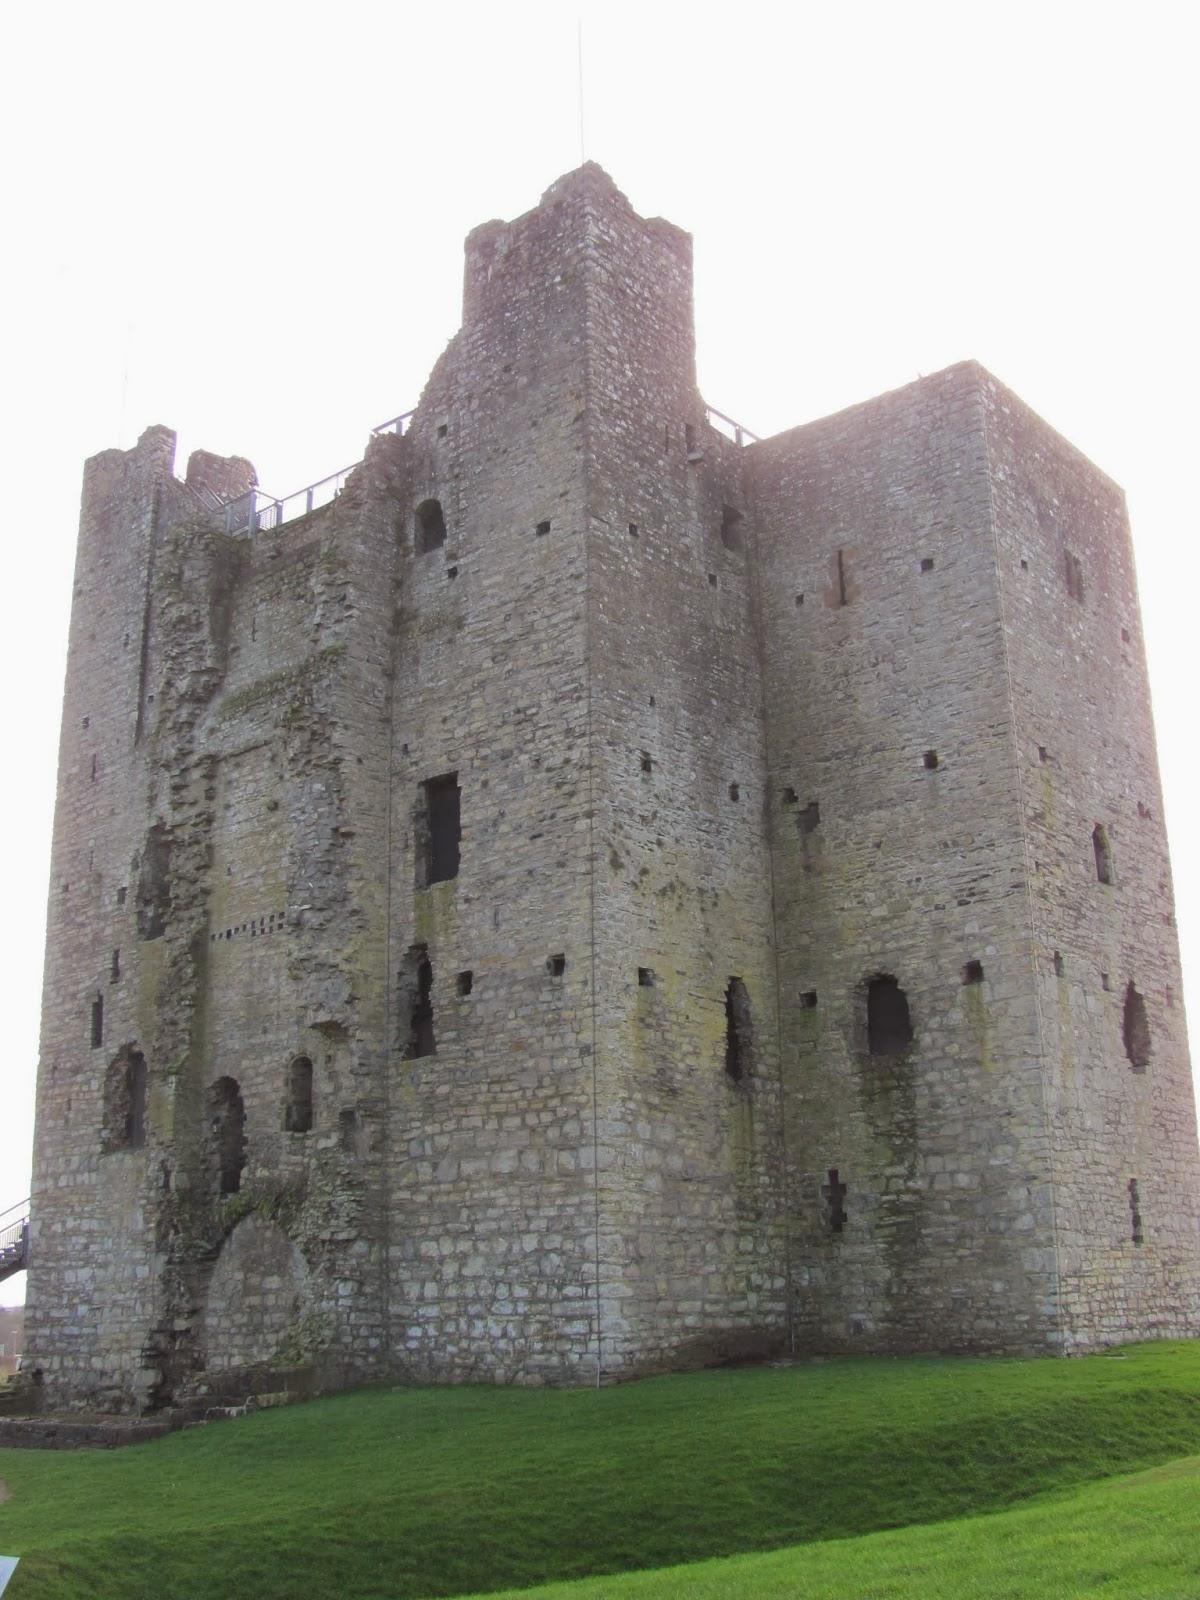 Trim Castle Keep in Trim, Ireland